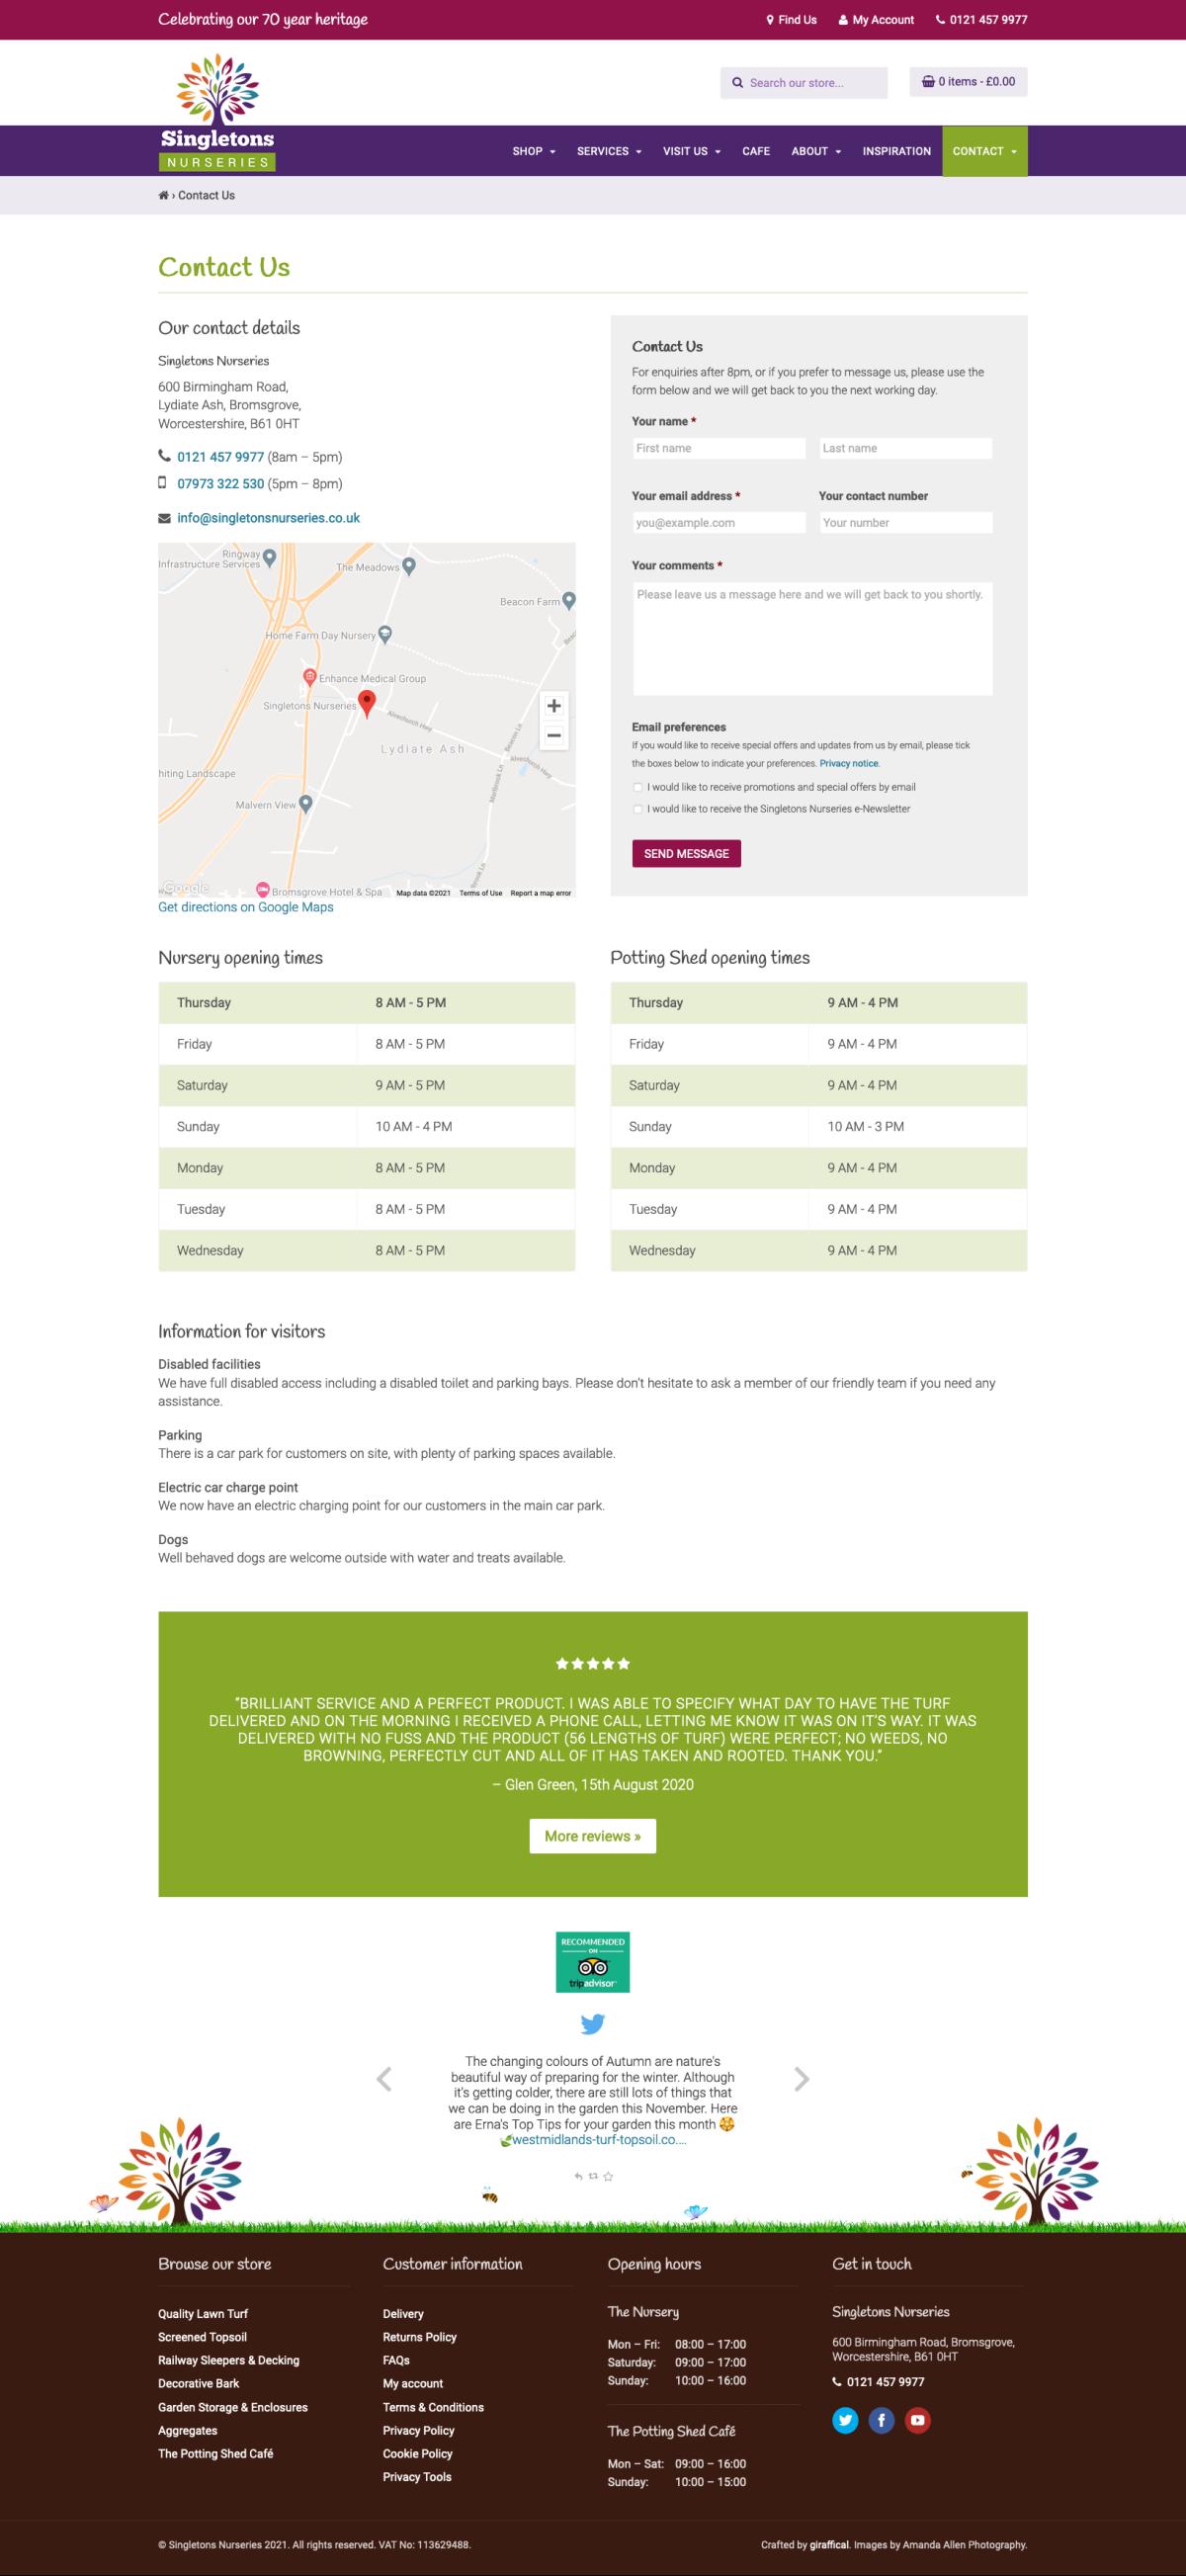 Garden Centre Website Design - Singletons Nurseries - Contact Page